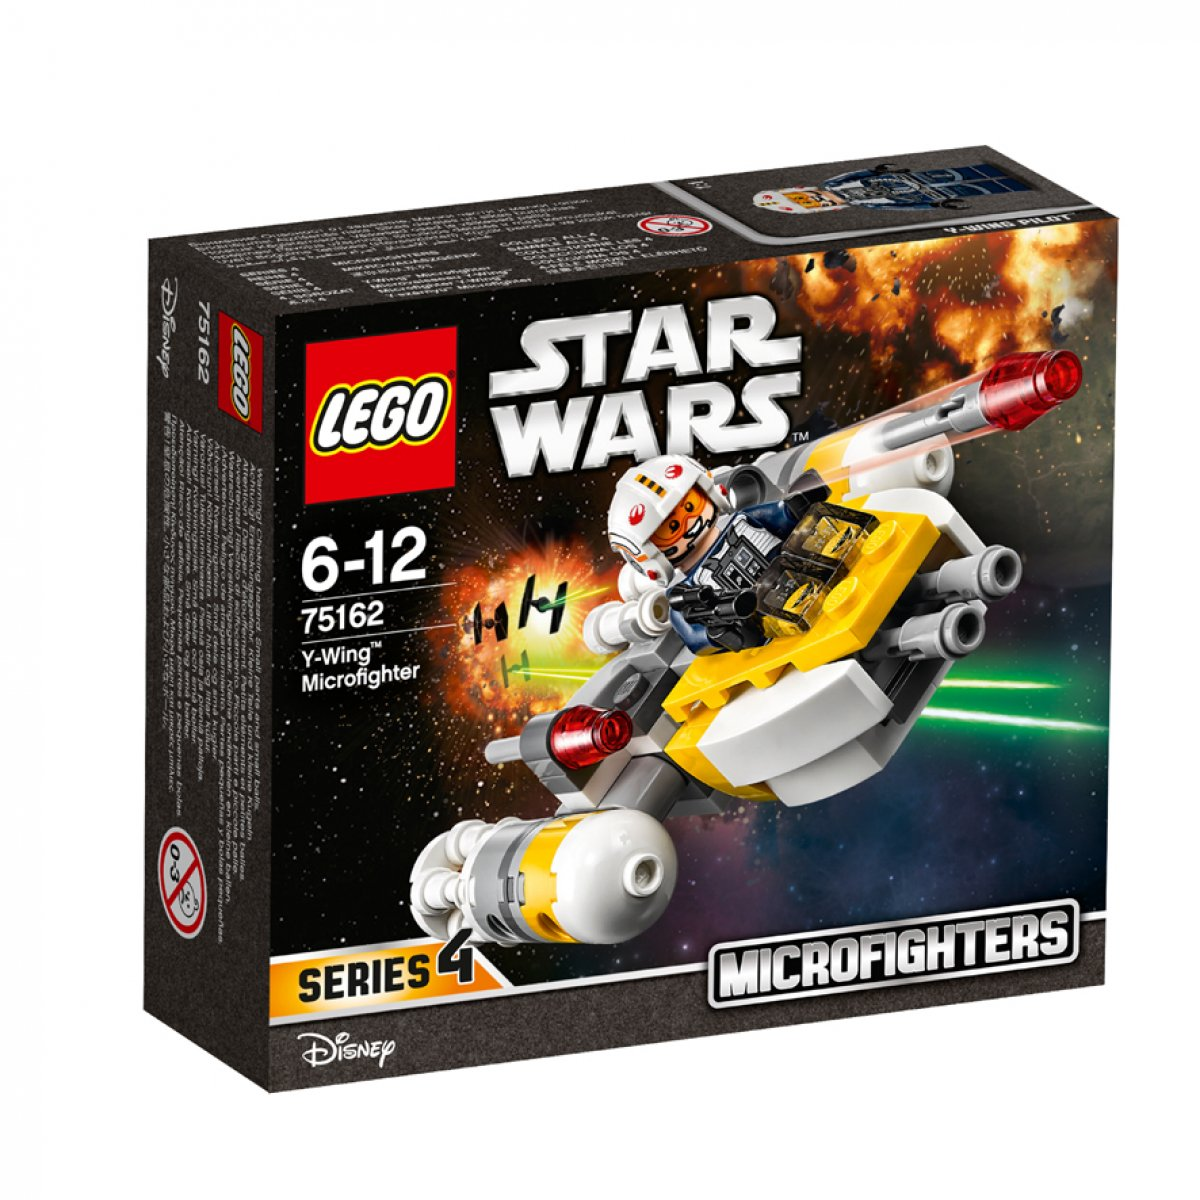 LEGO® Star Wars 75162 Microfighter 3 - Confidnetial